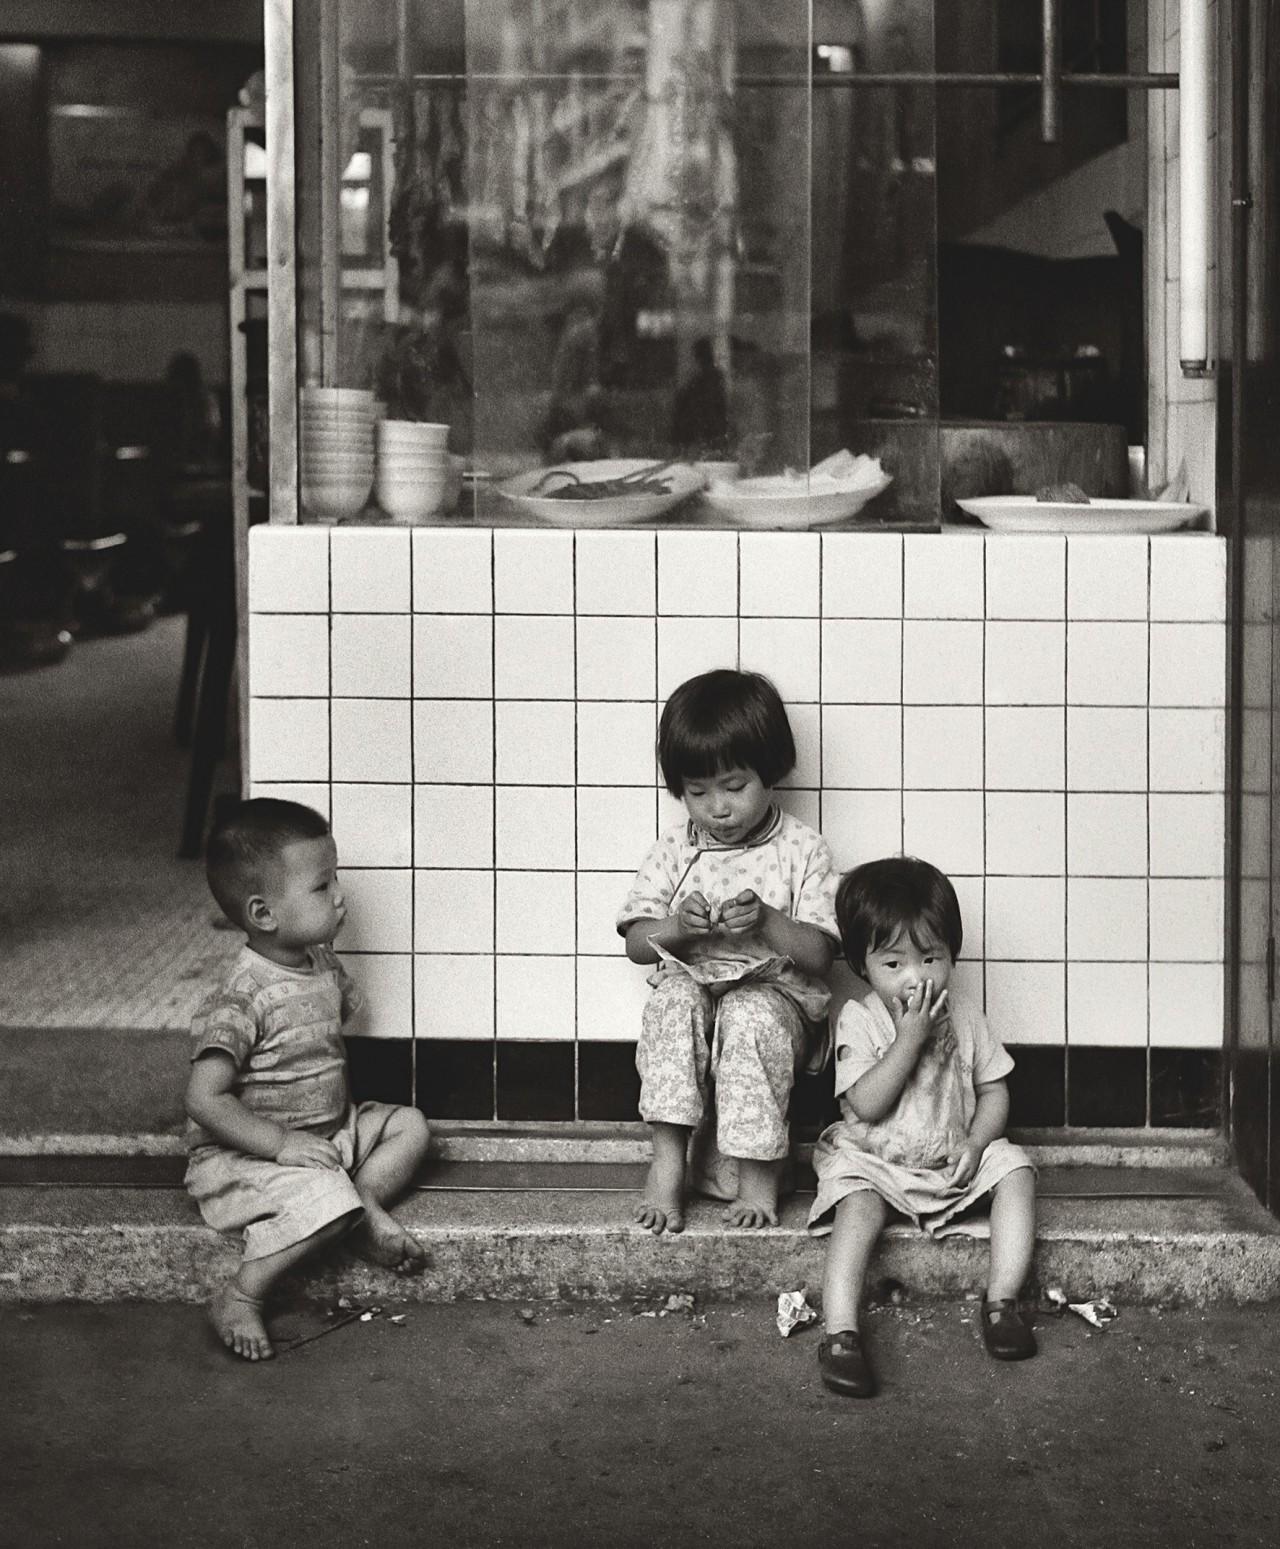 В ожидании мамы, Гонконг, 1960-е. Автор Фан Хо